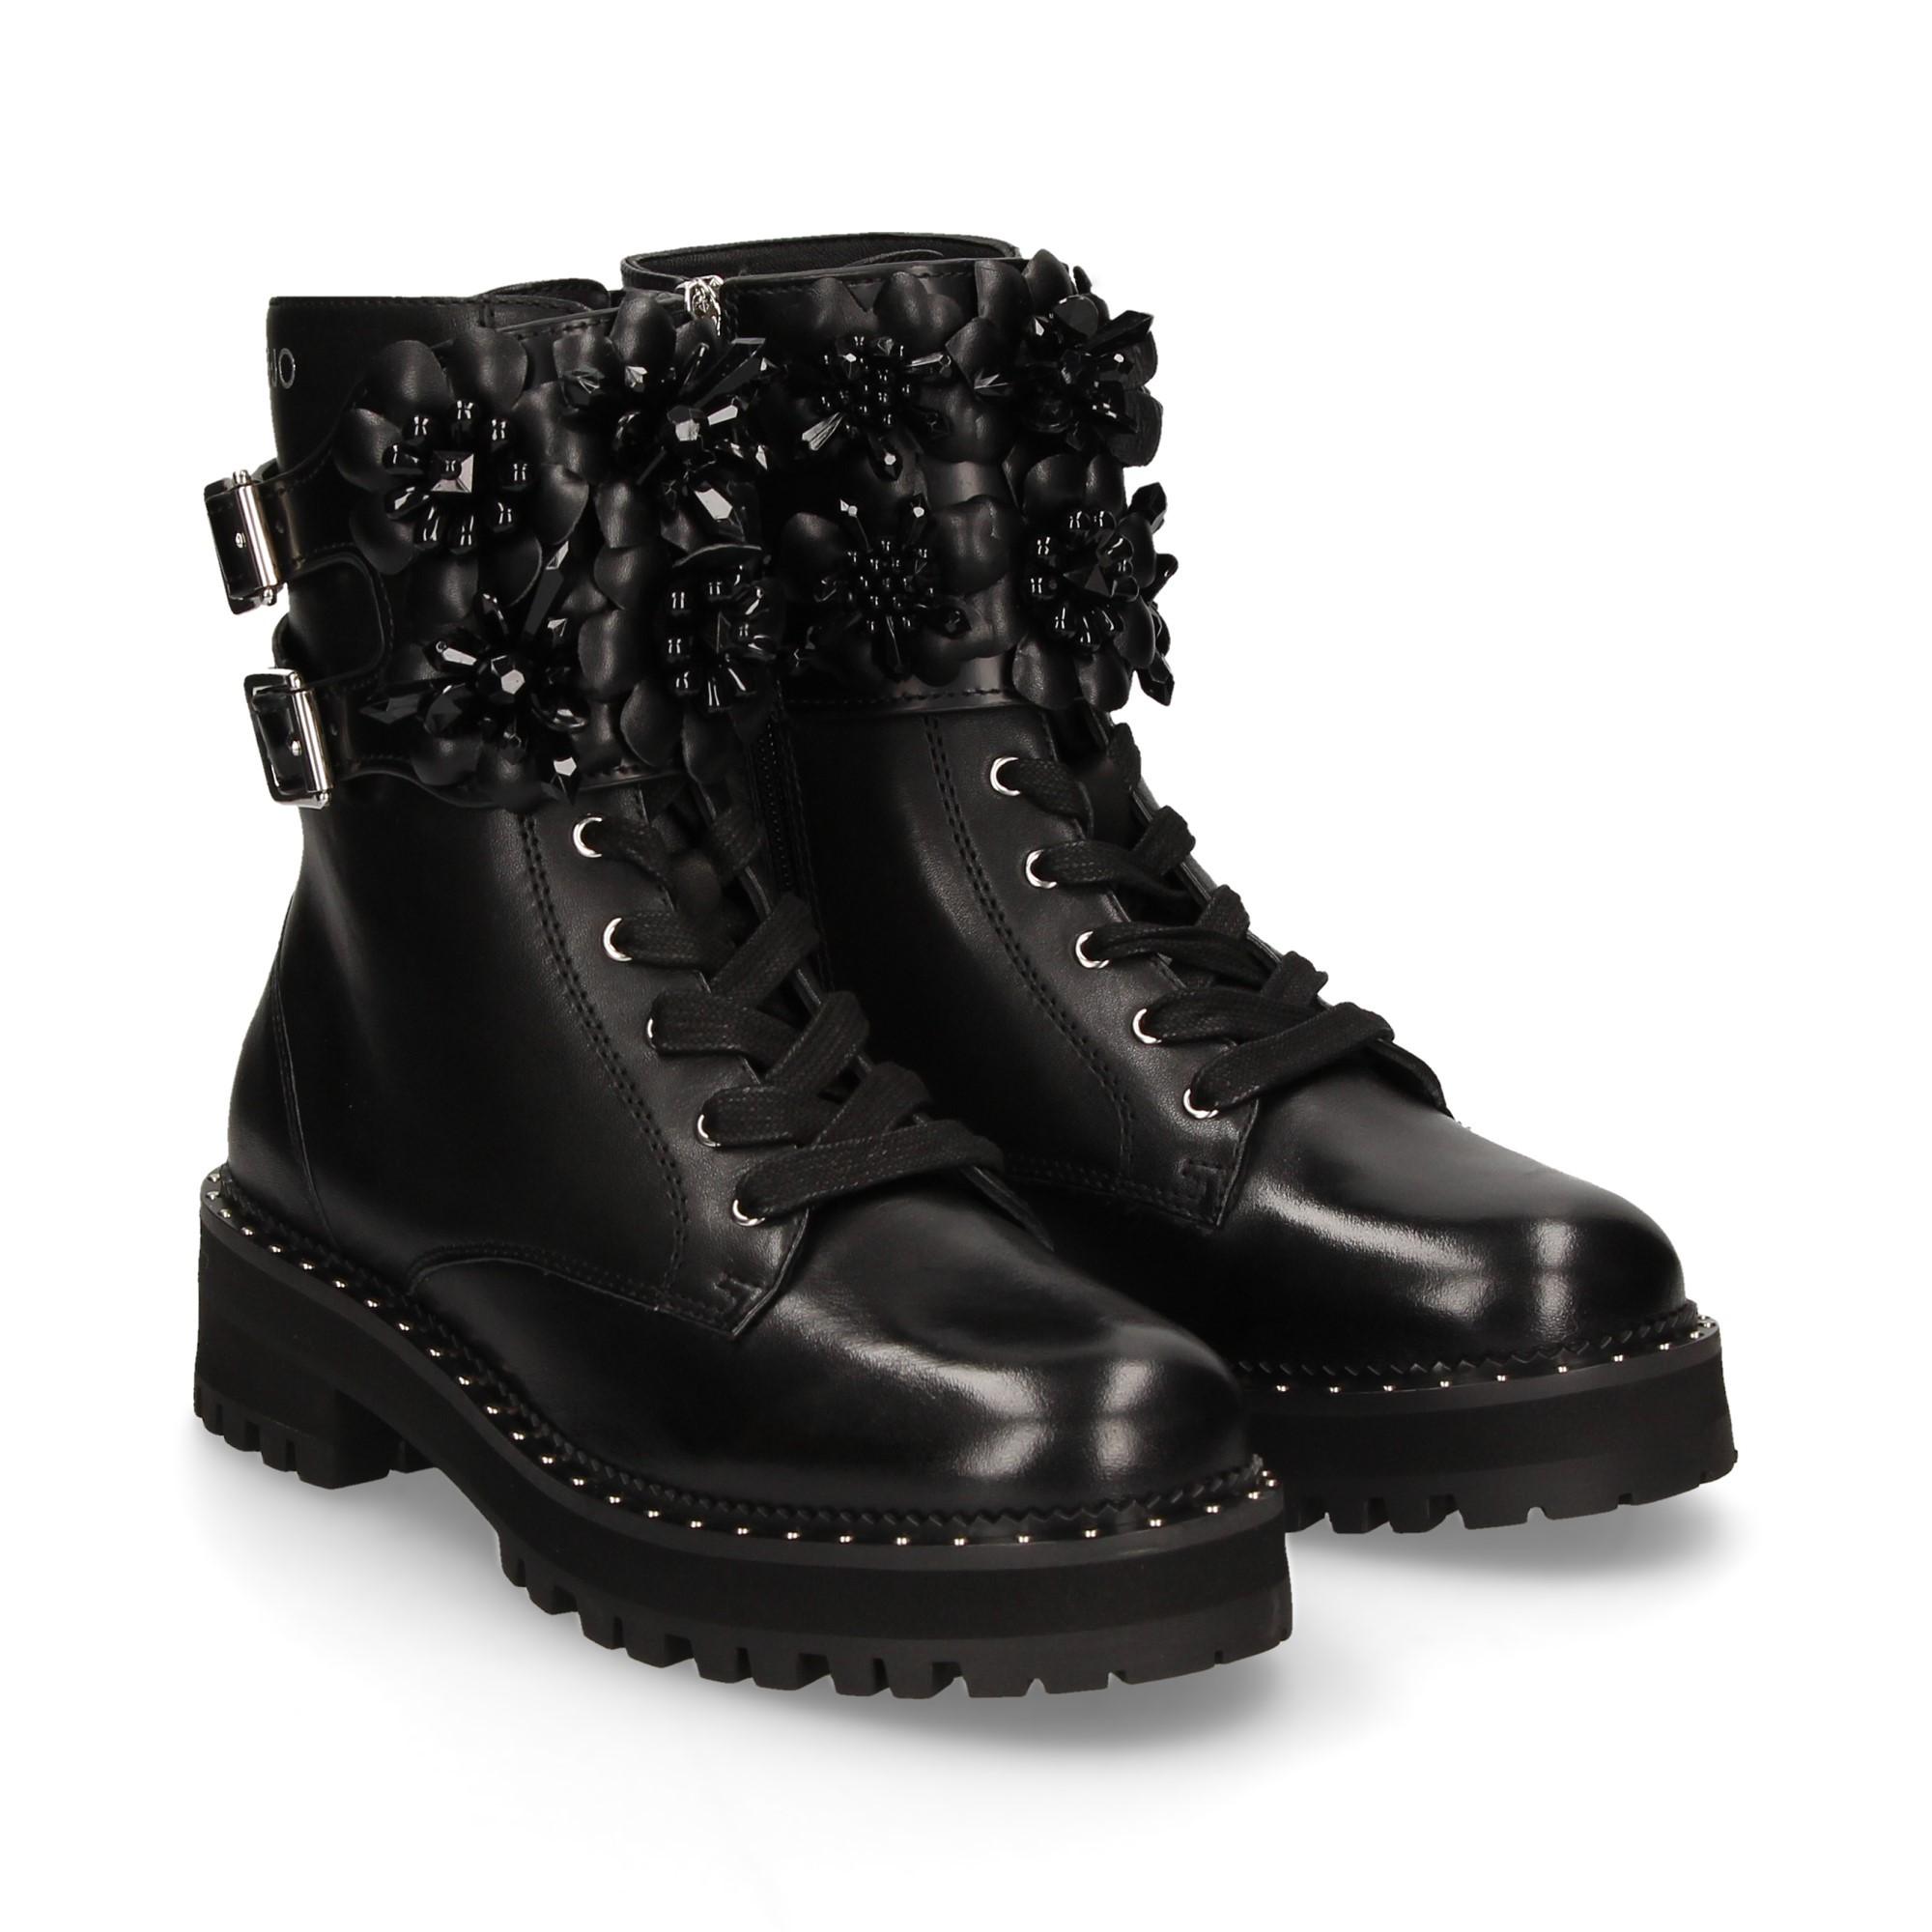 Adjunto archivo Circunstancias imprevistas Hobart  LIU·JO Women's flat ankle boots S69103 PX015 22222 NEGRO